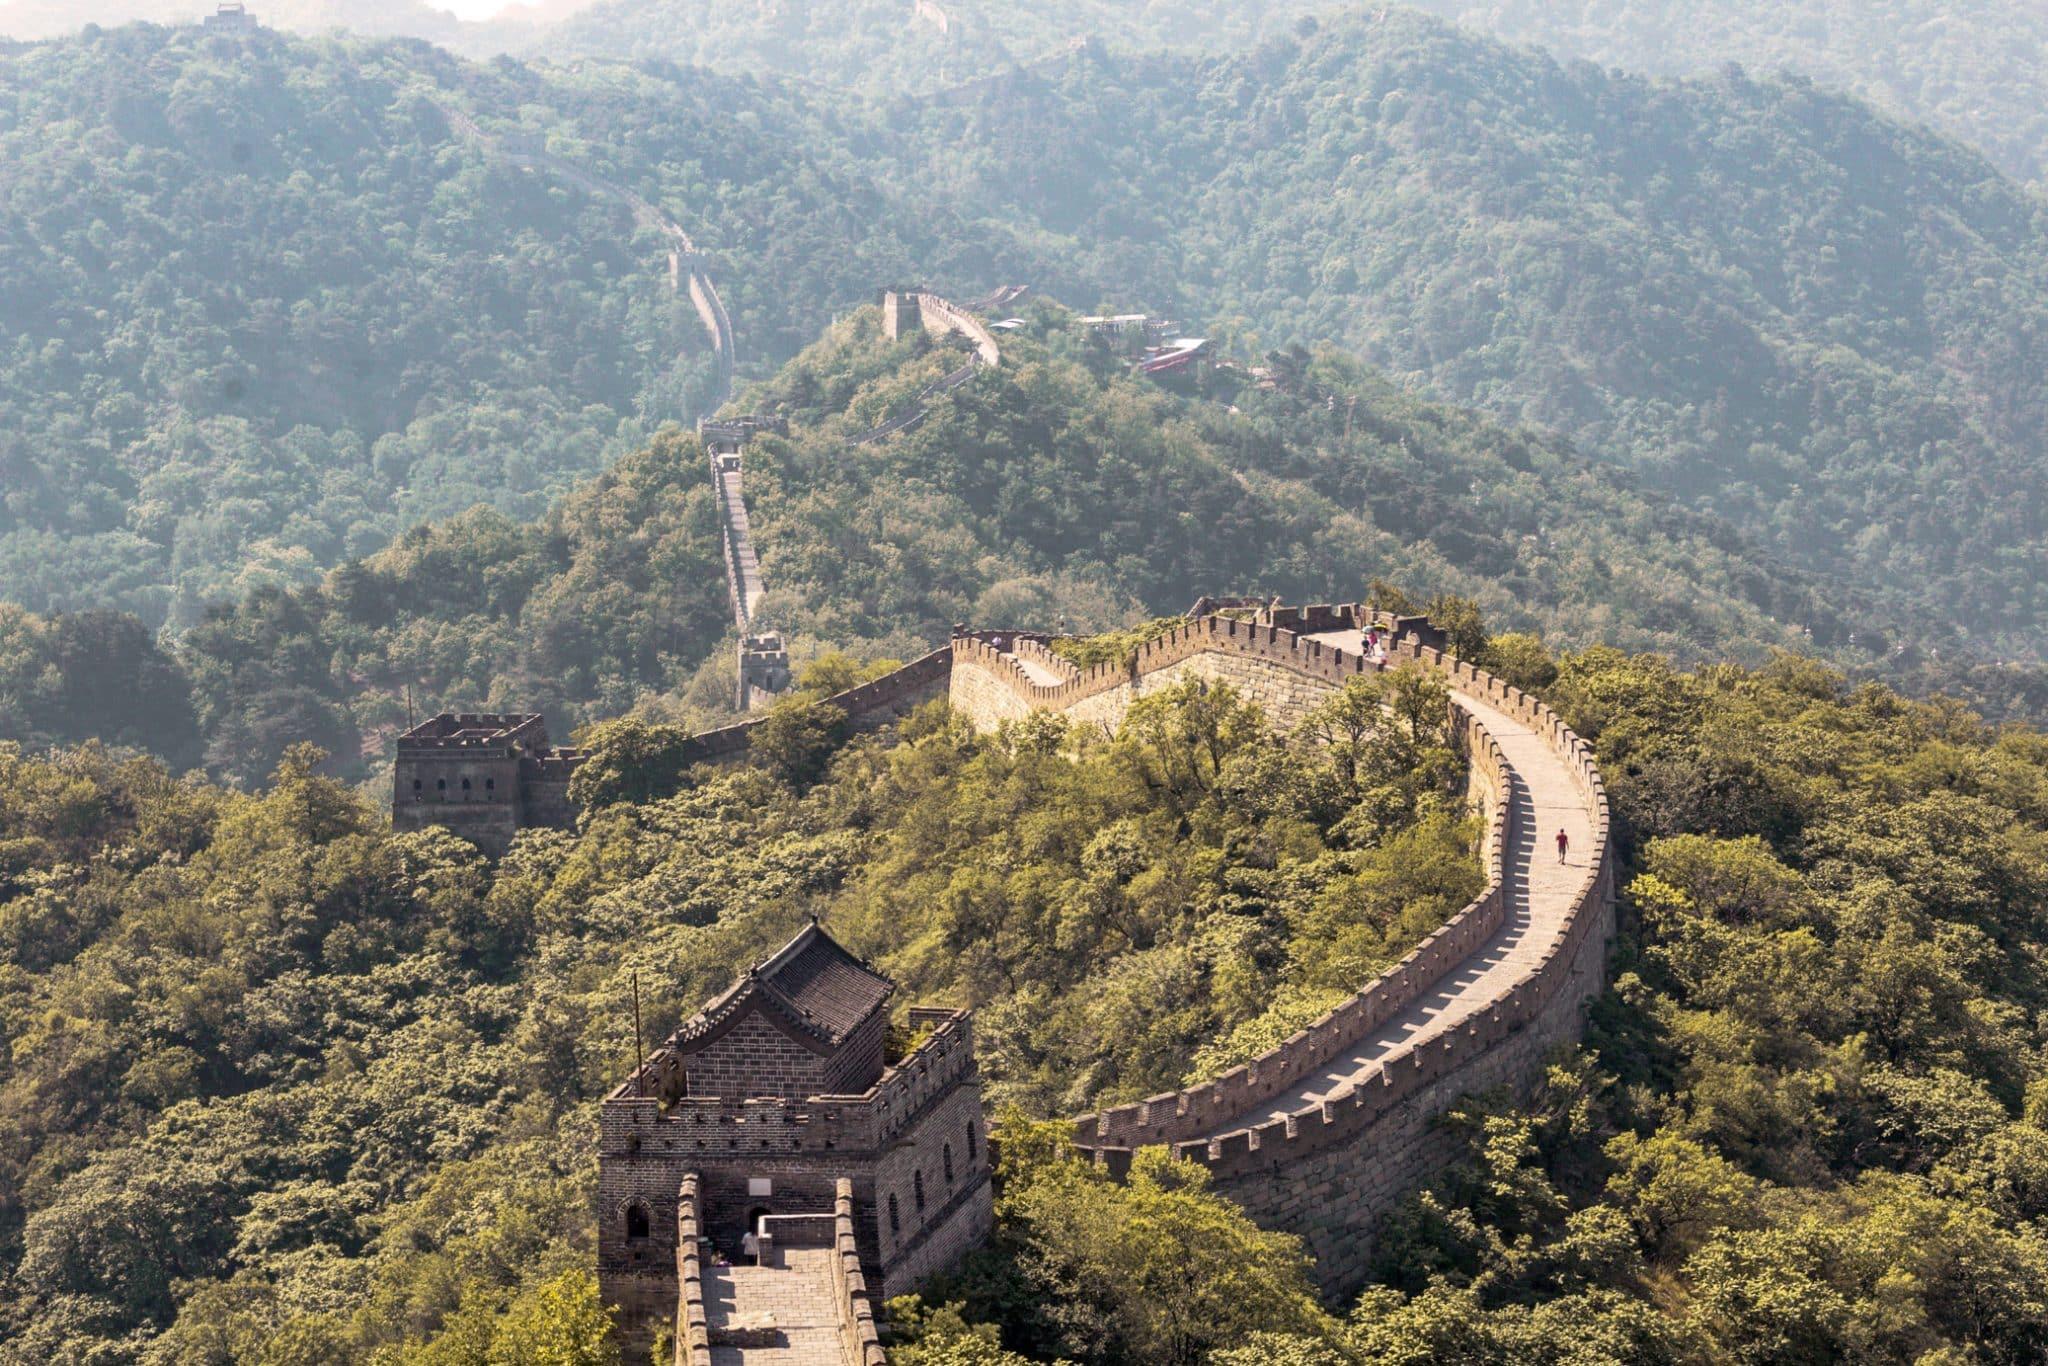 Visit Great Wall of China without crowds Mutianyu